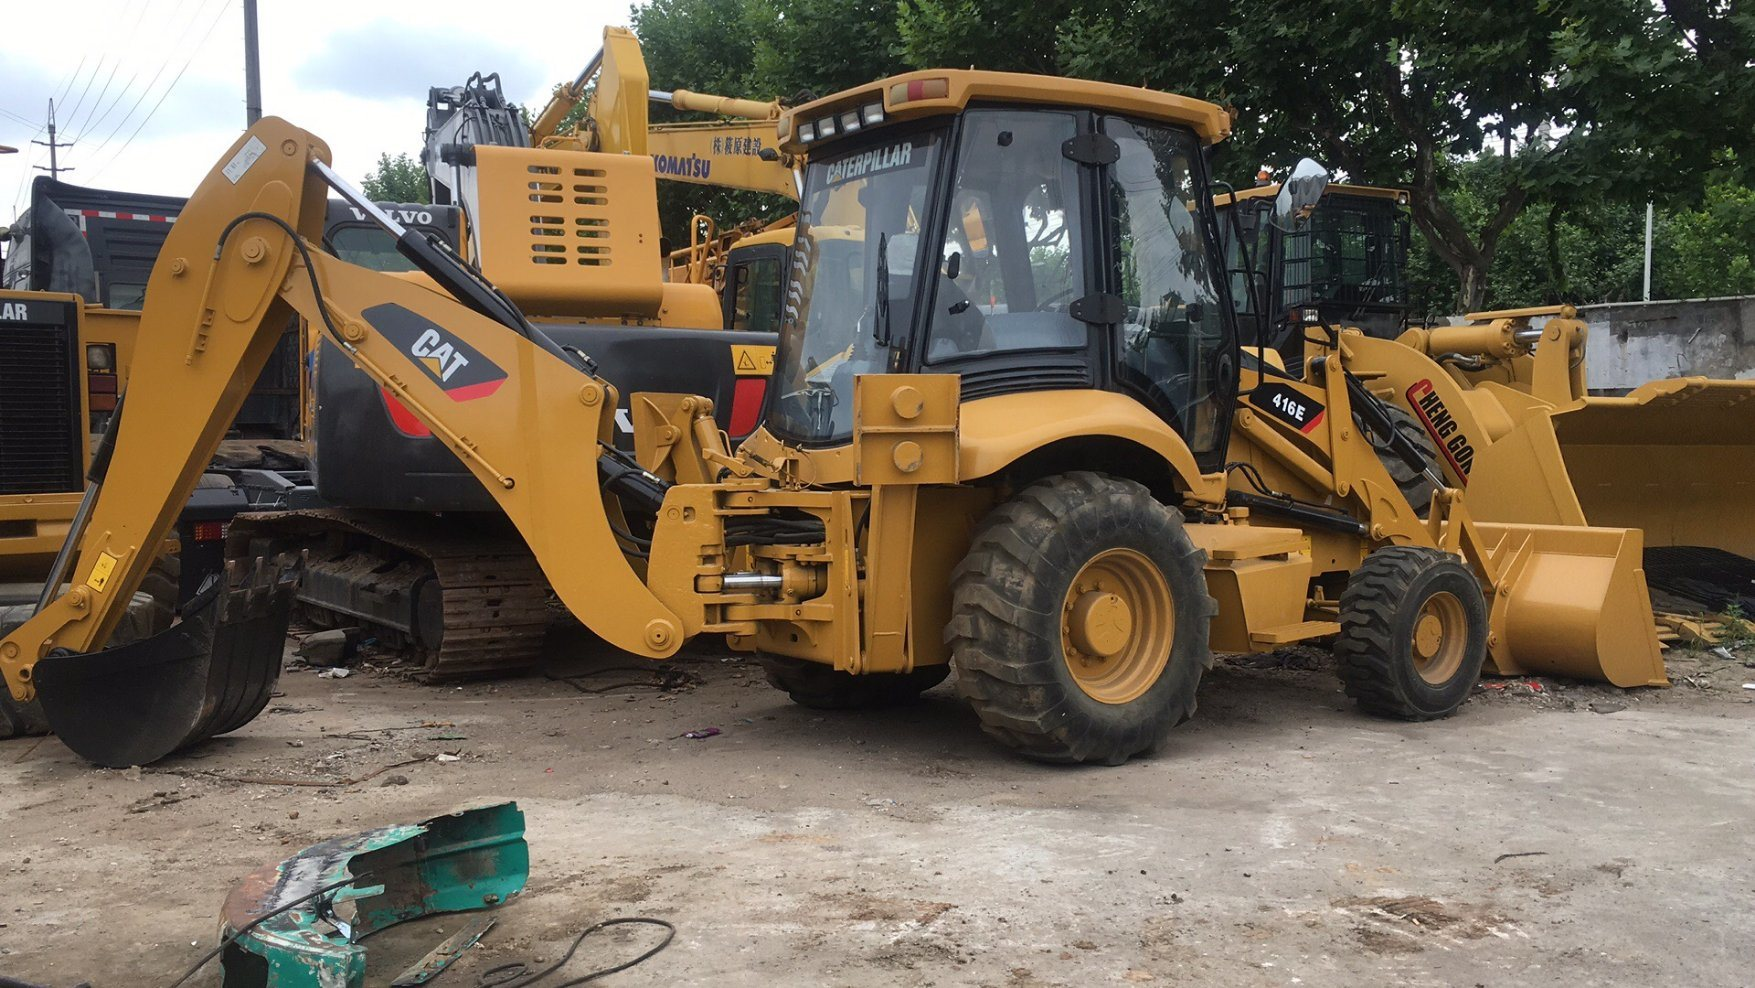 Wholesale Caterpillar Excavator Loader - Buy Reliable